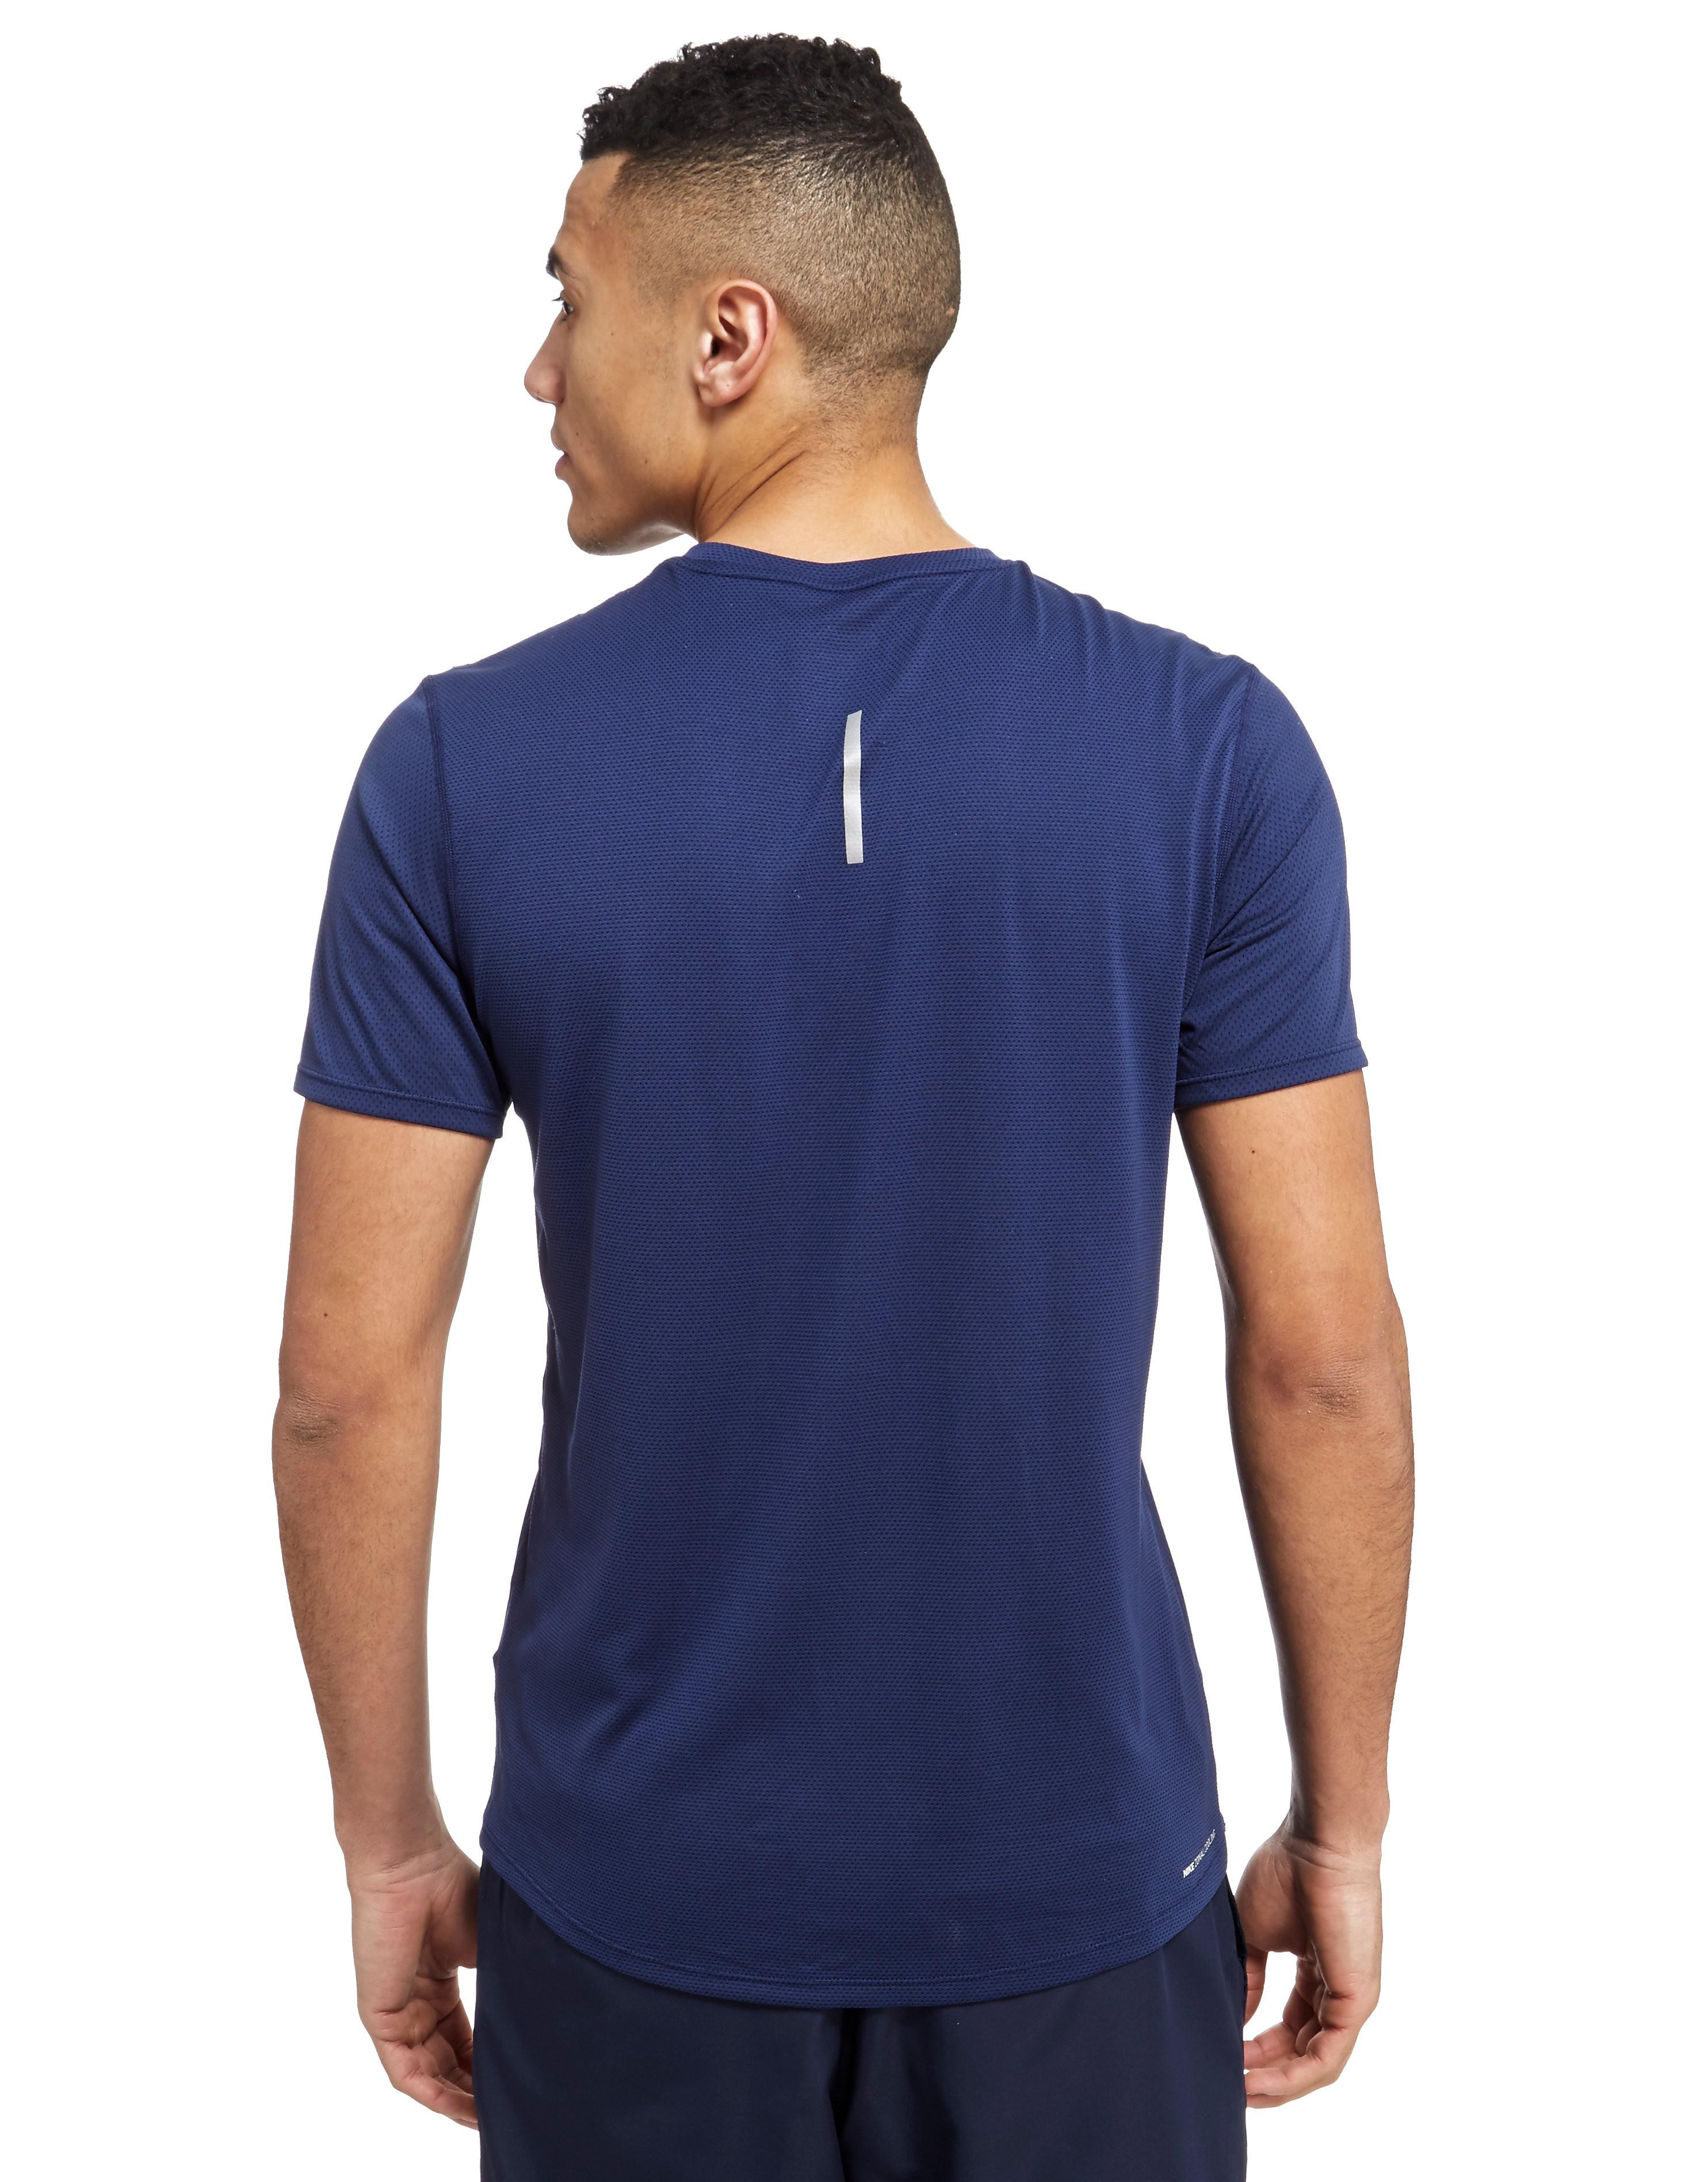 Nike Zonal Cooling Relay T-Shirt